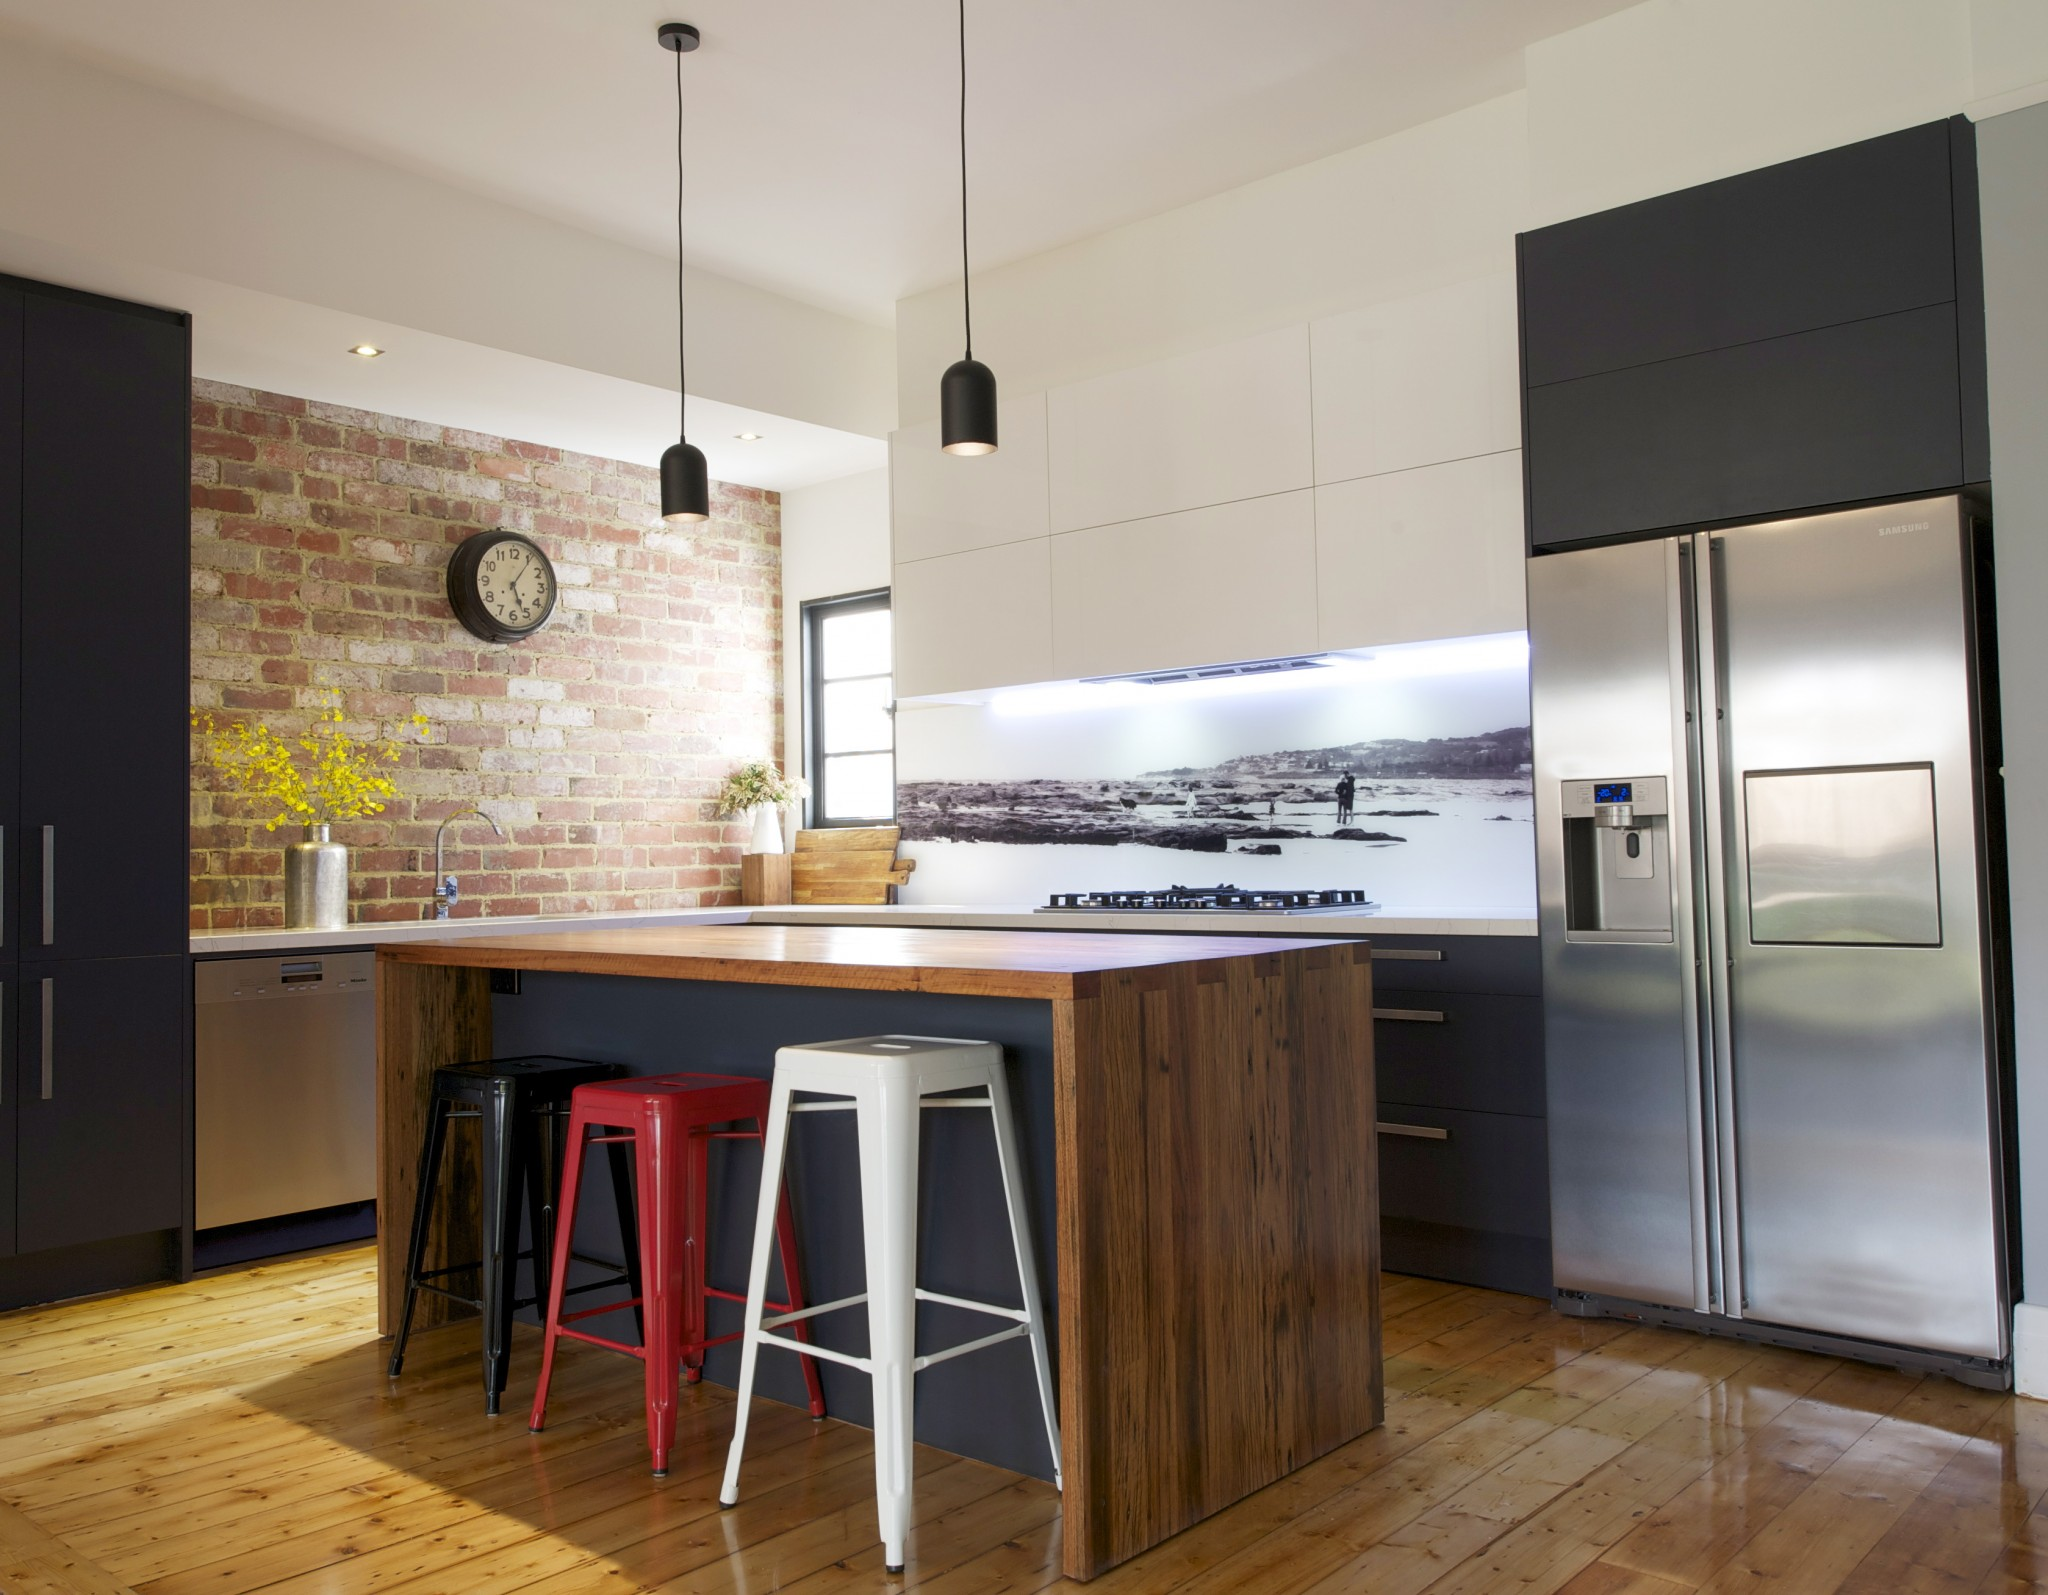 Polyurethane Doors Kitchens & Alder Cabinets Awesome ...